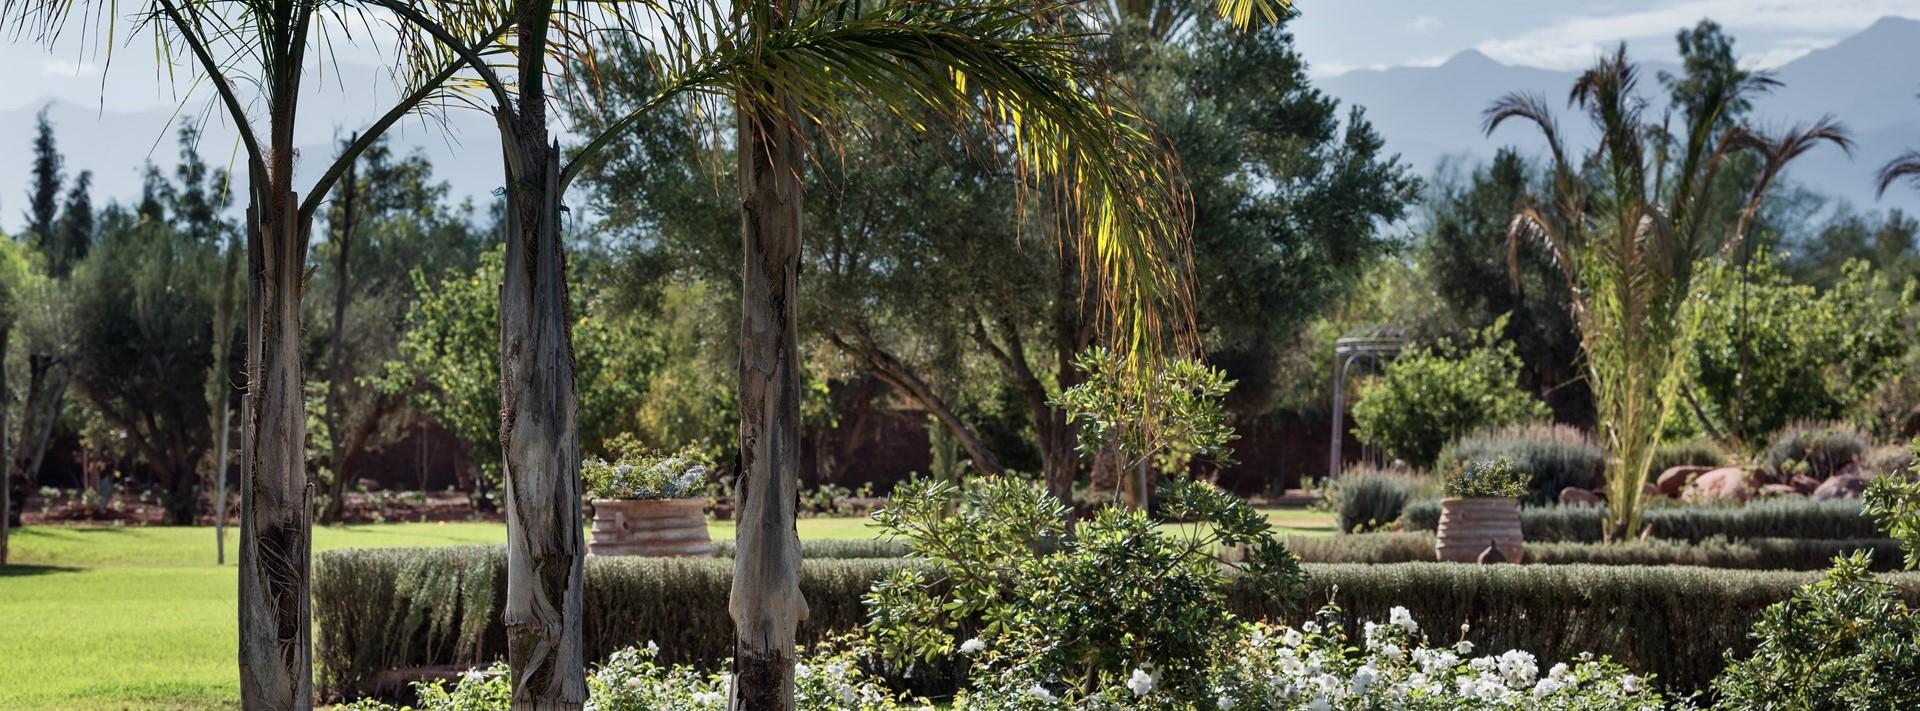 dar-yasmina-landscaped-gardens